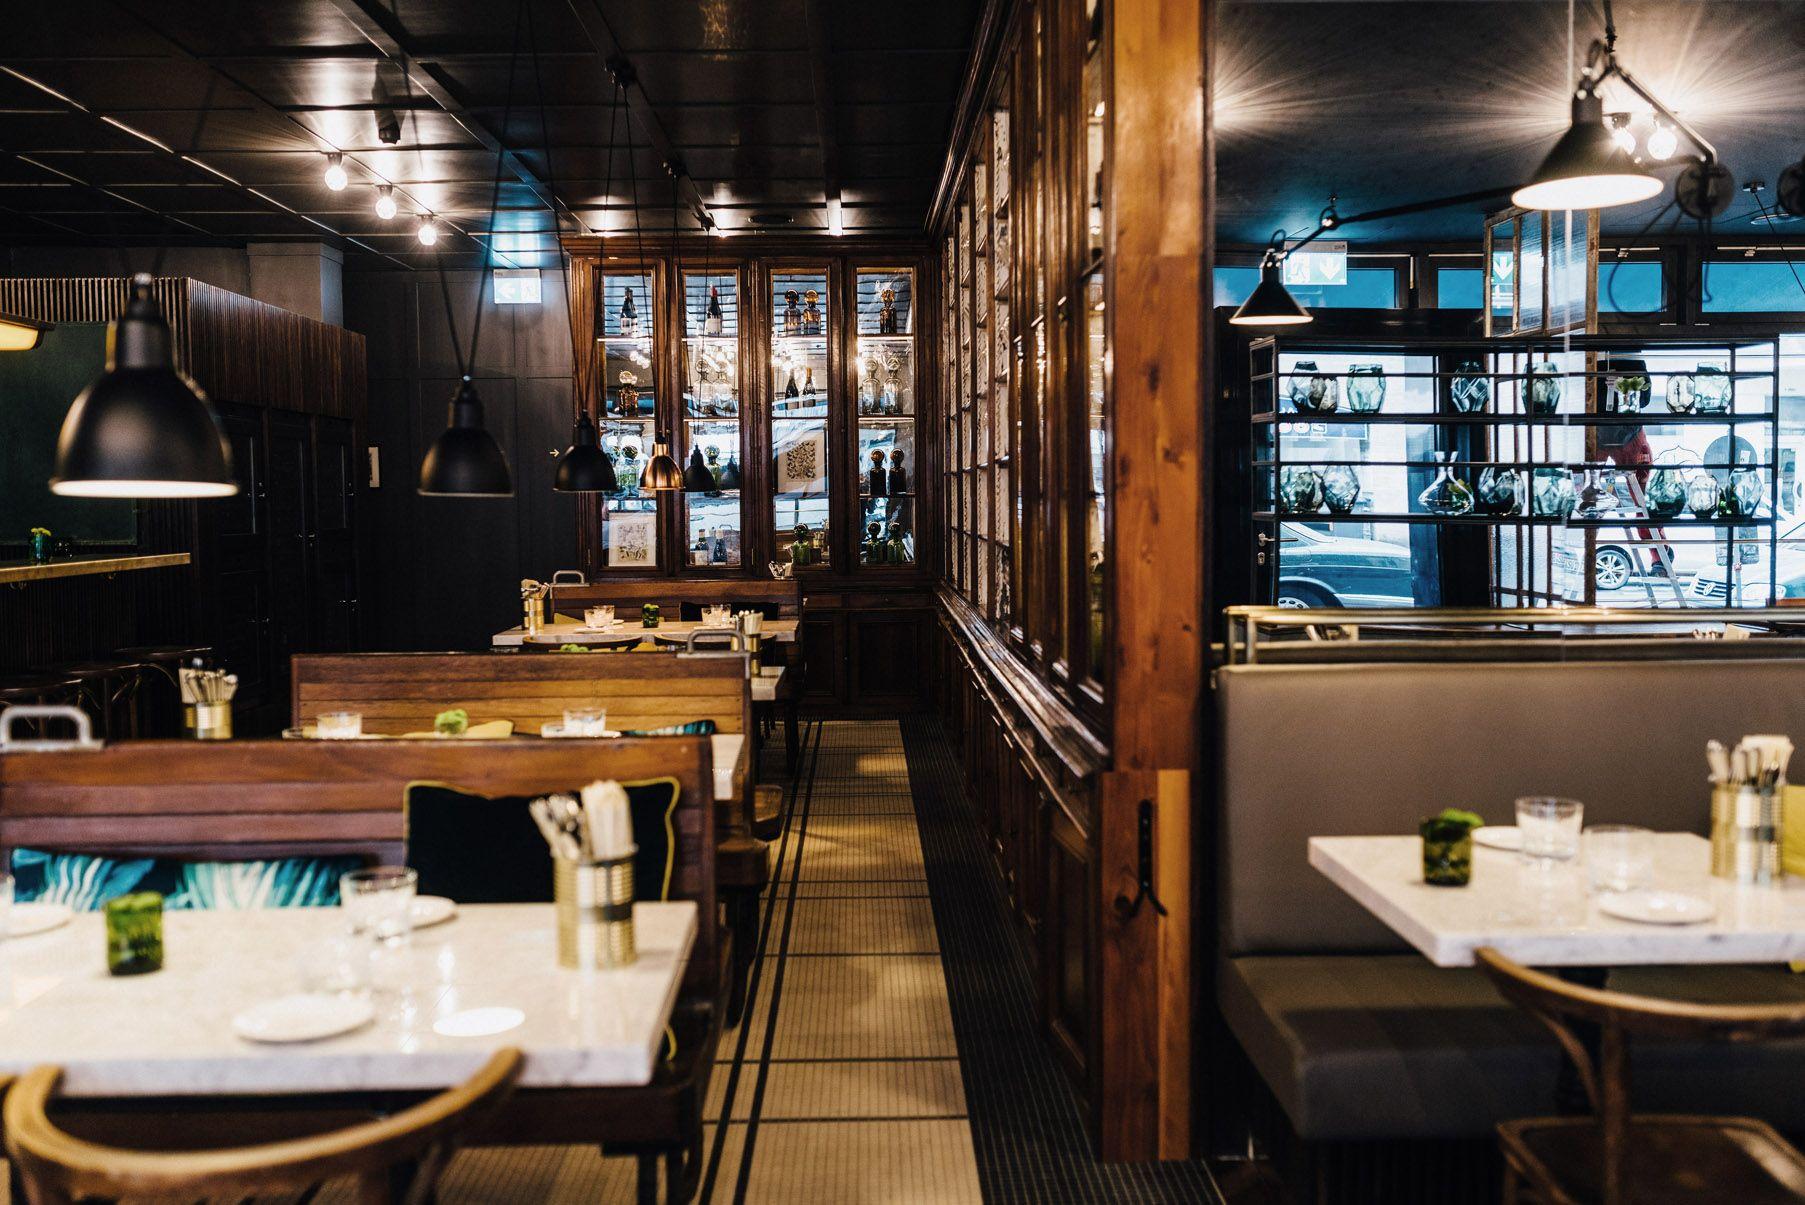 tertianum - restaurant - brasserie - timber - panelling - mirrored